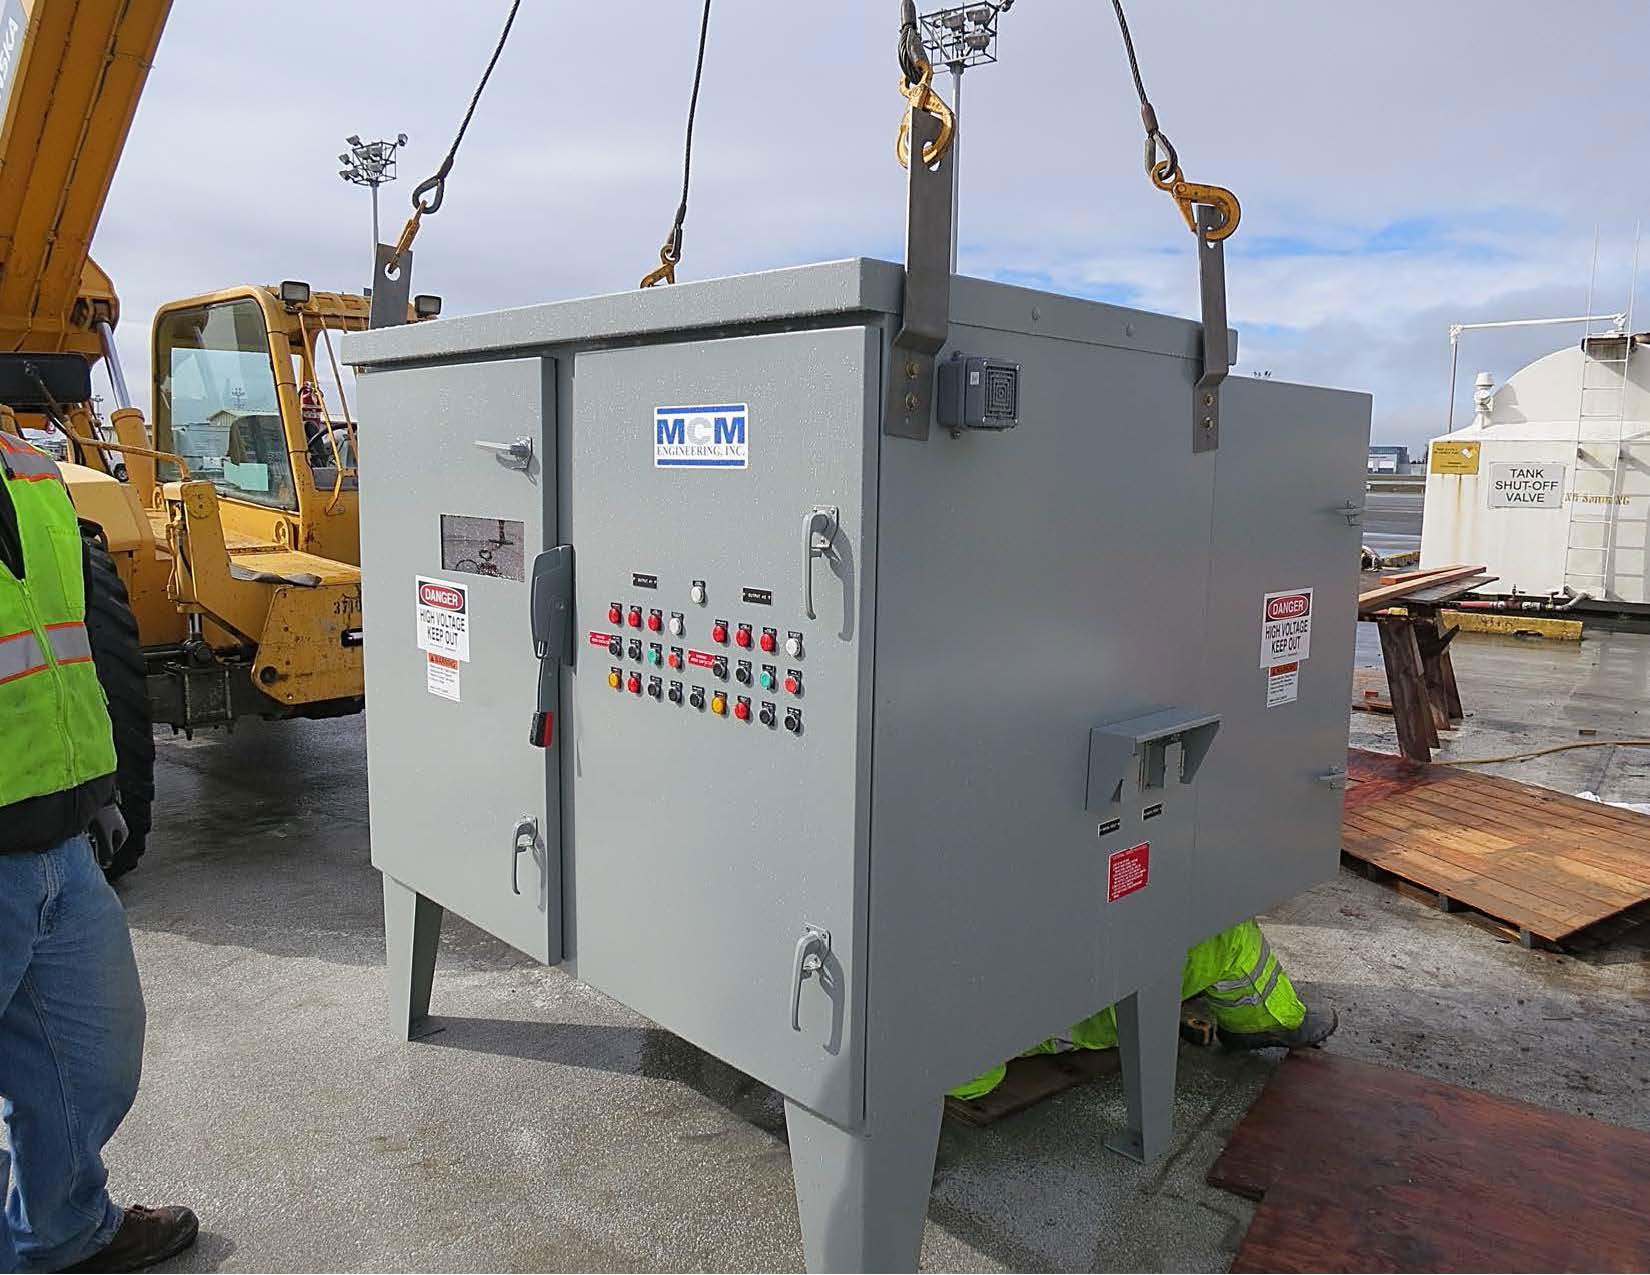 Dutton Electric work